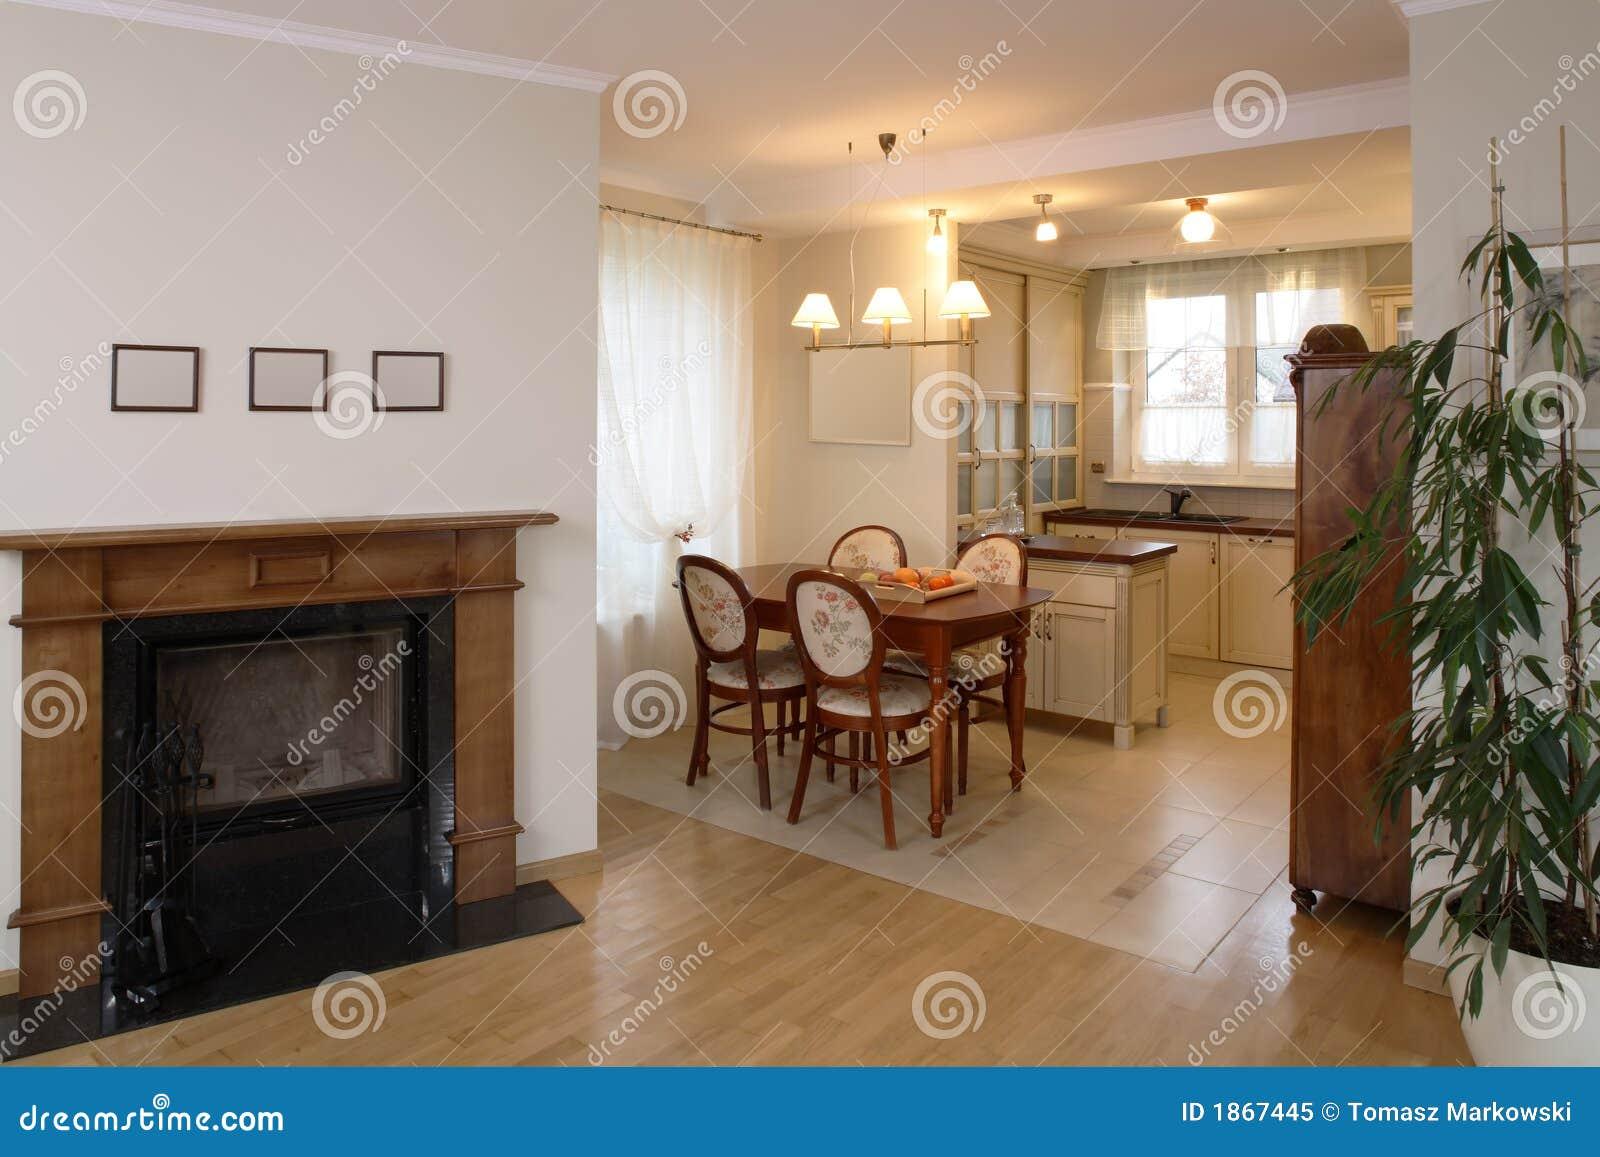 Klassieke Woonkamer En Keuken Stock Afbeelding - Afbeelding ...